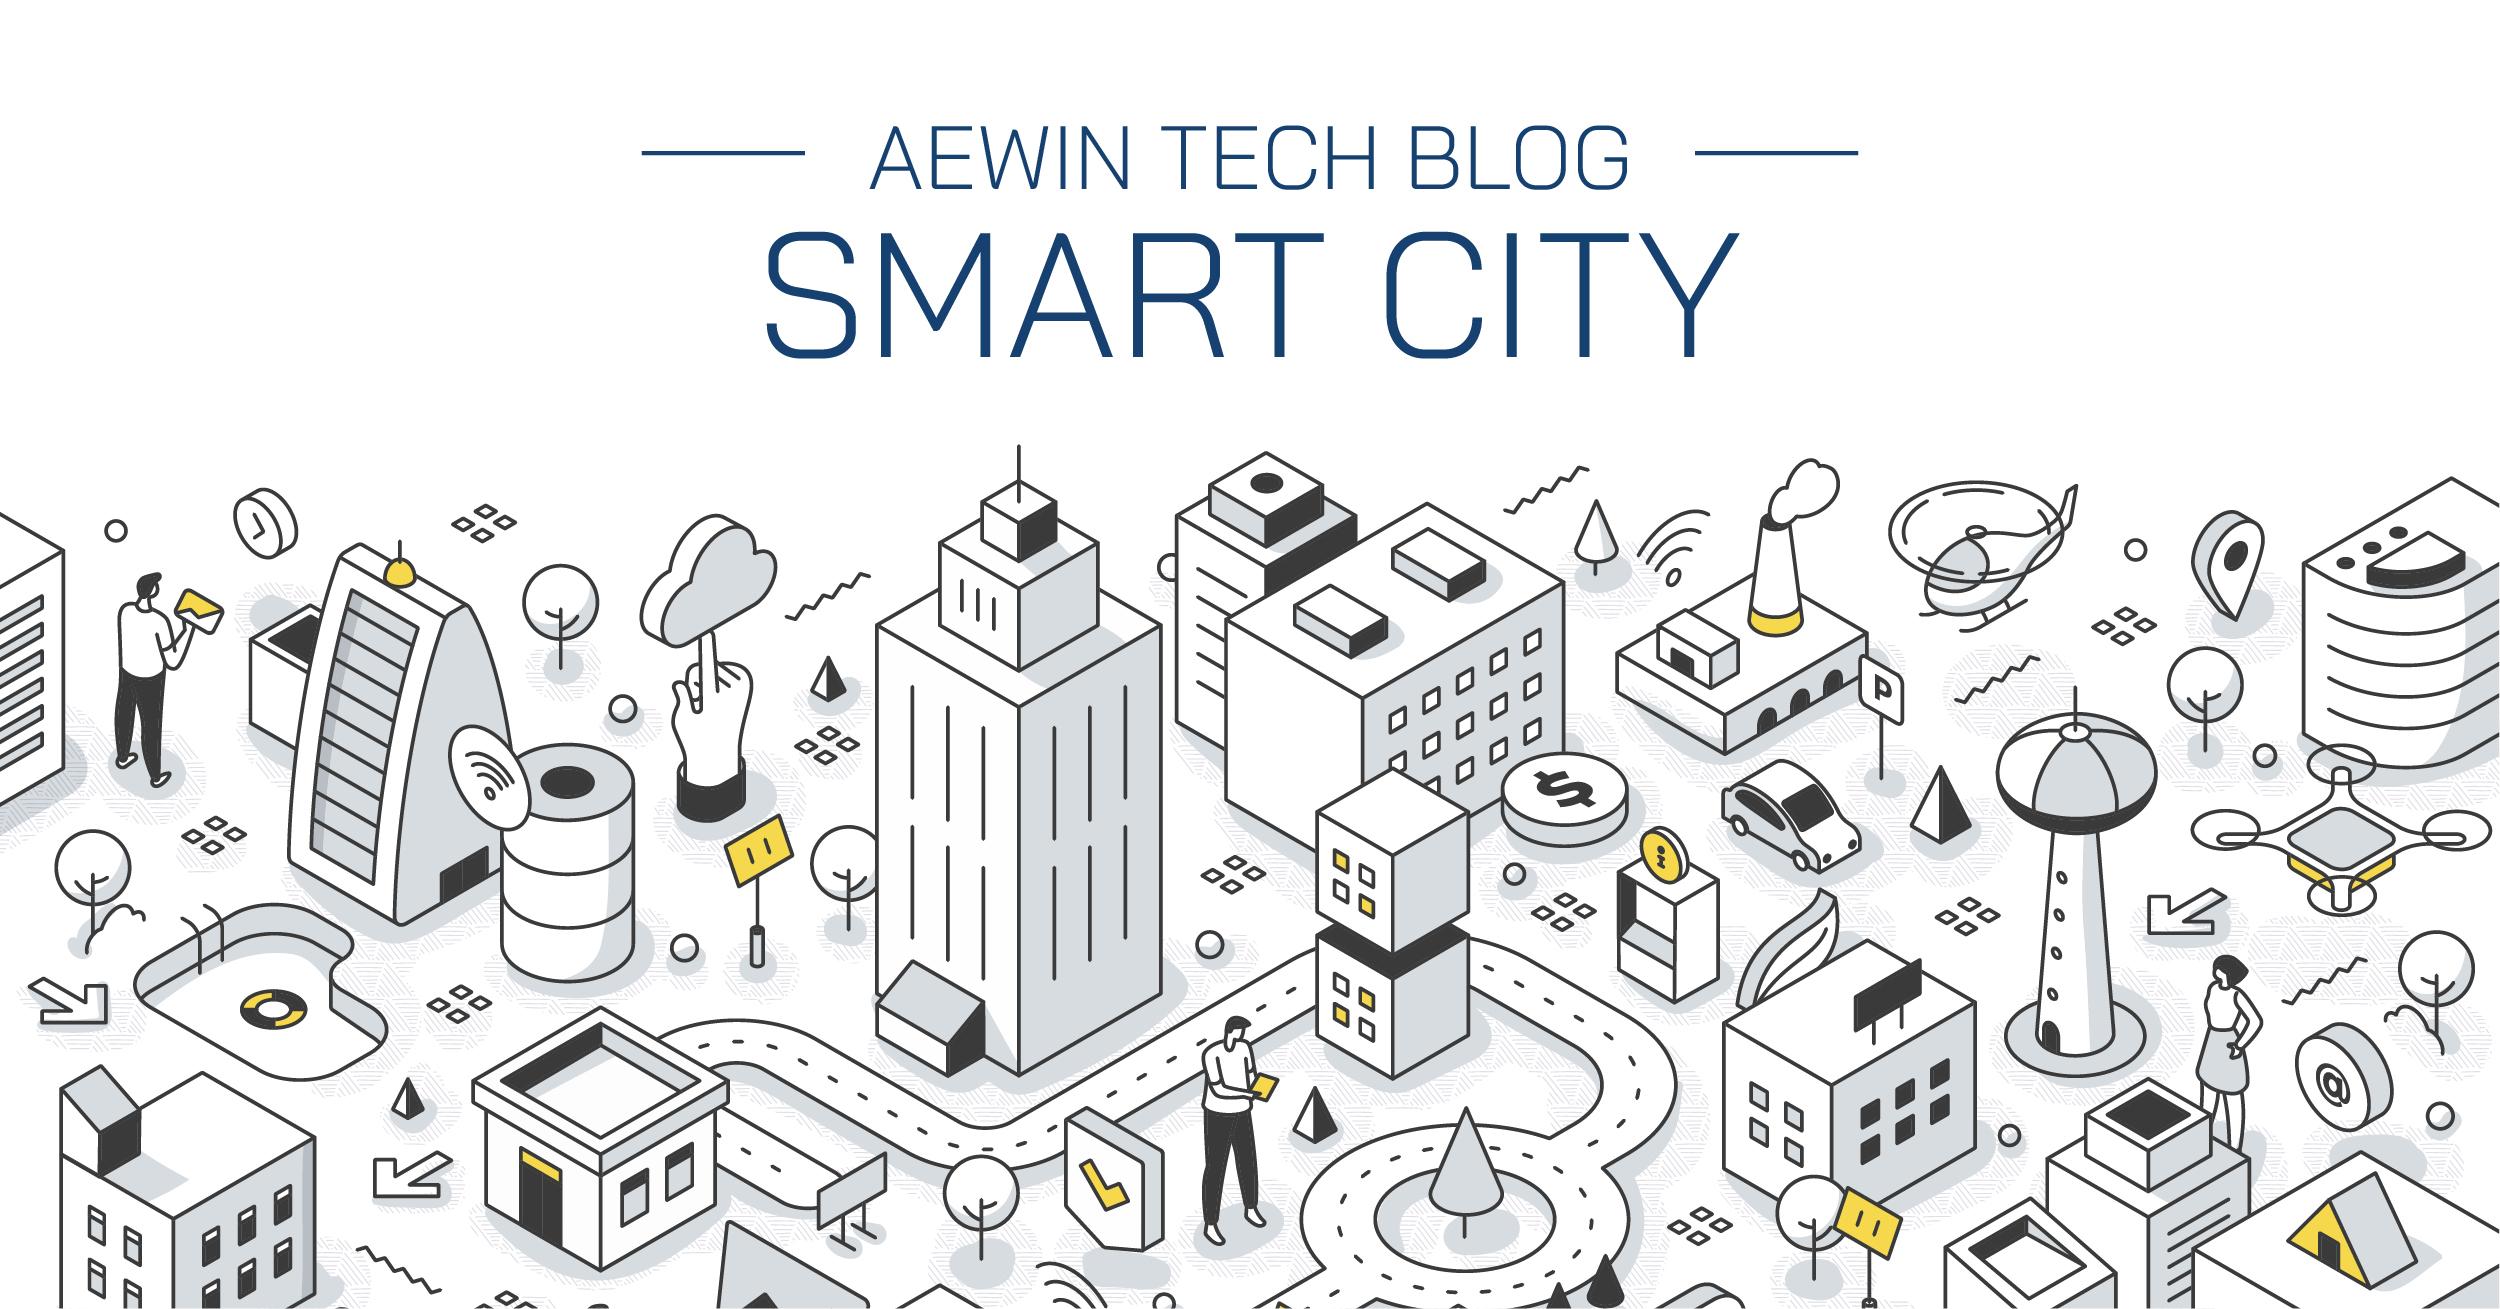 aewin's smart city solutions